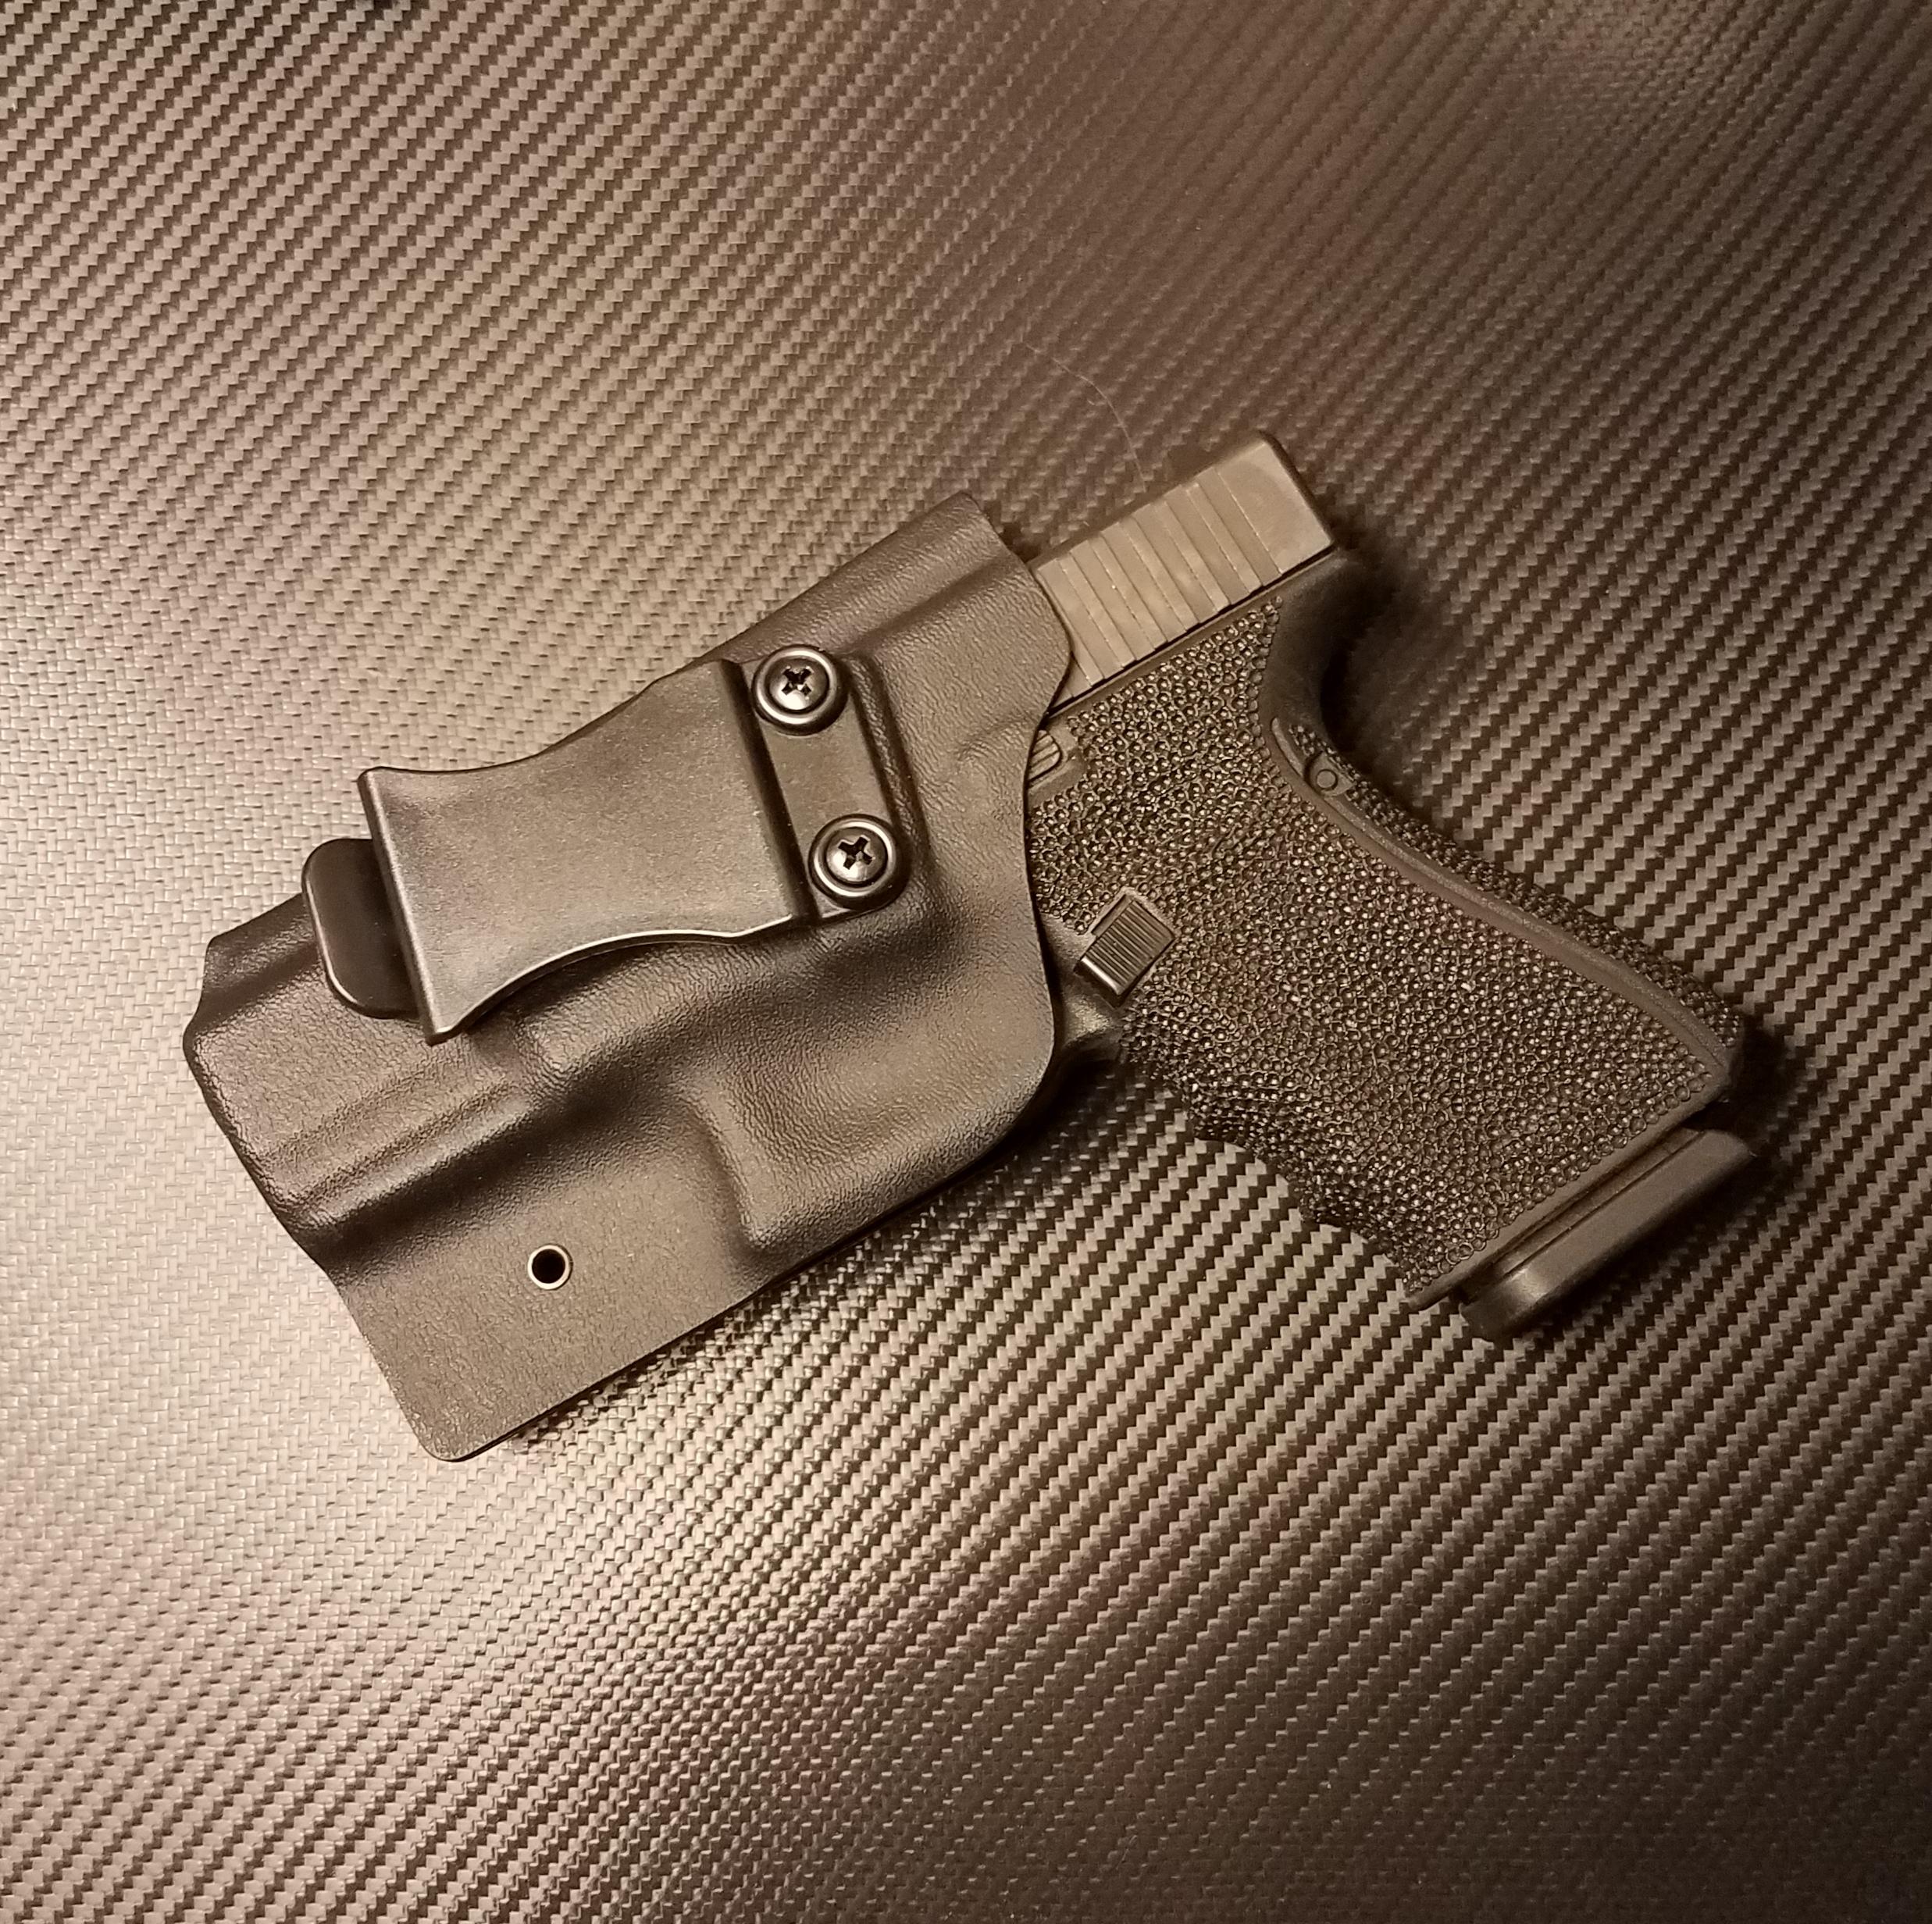 DCTACTFGHG19B Glock 19, Glock 23, Glock 32 Black Kydex Gun Holster